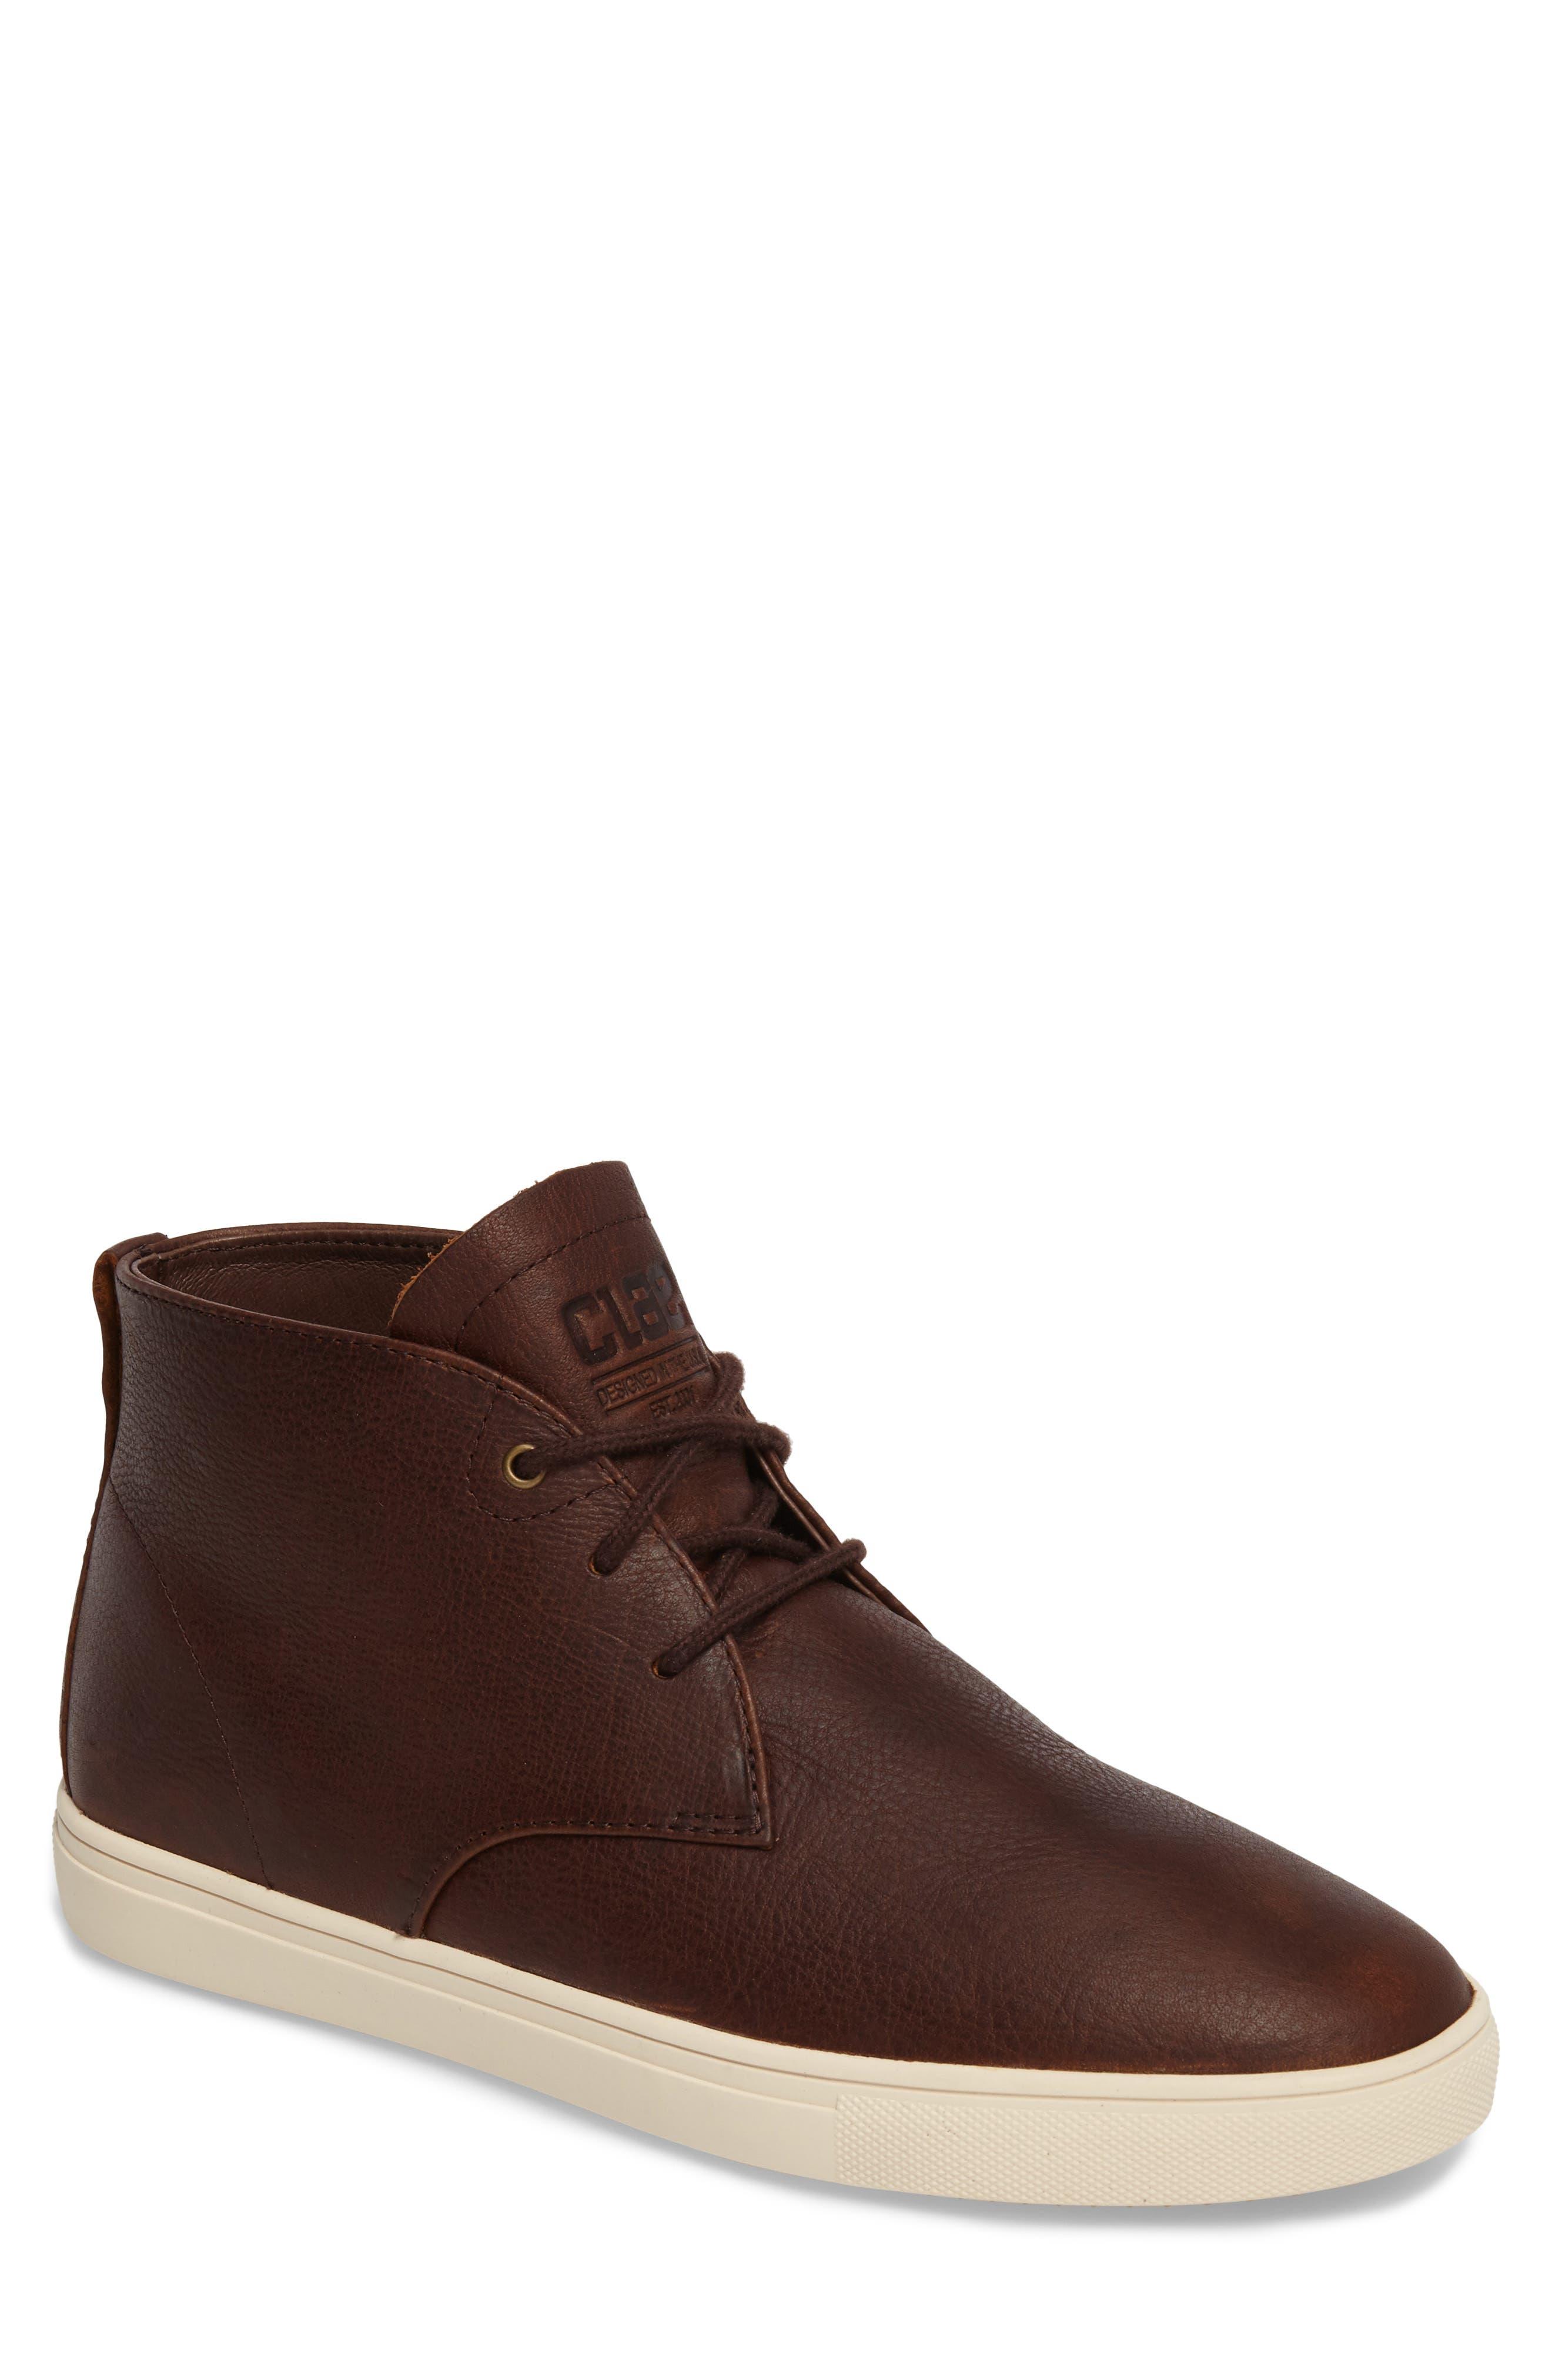 'Strayhorn SP' Chukka Boot,                             Main thumbnail 1, color,                             Cocoa Leather